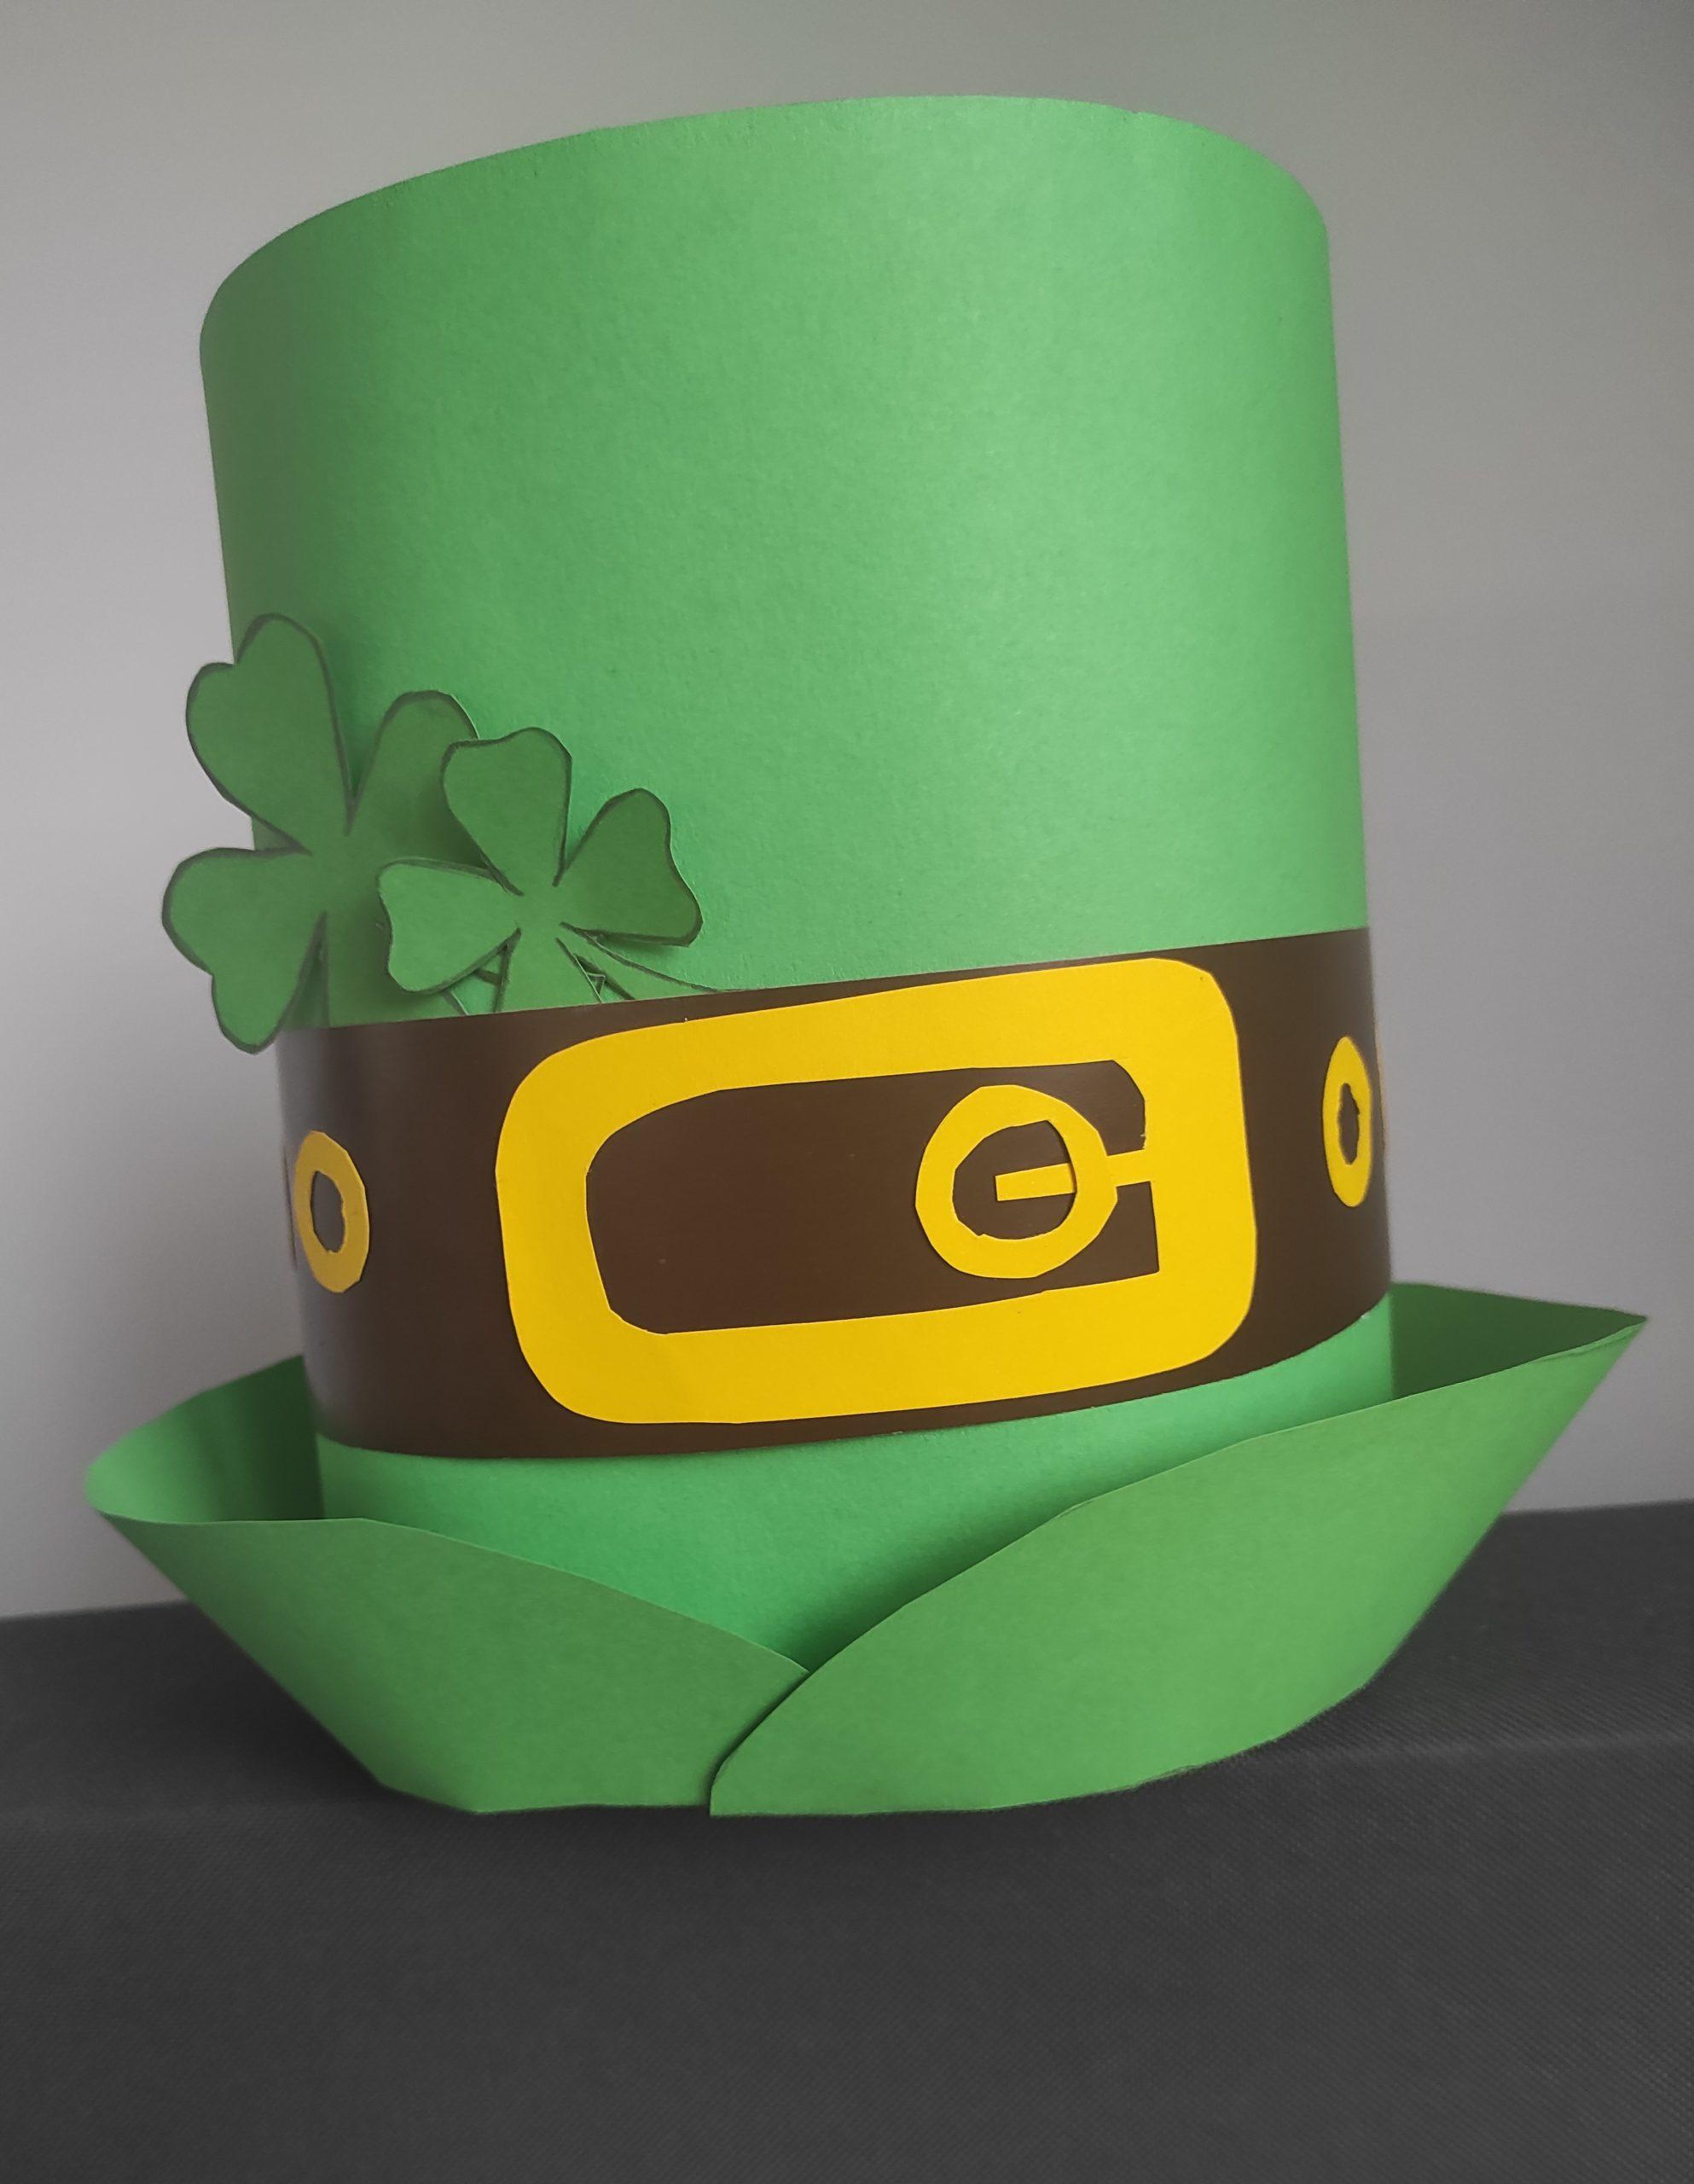 Saint Patrick's Day – 17 marca 2021r.